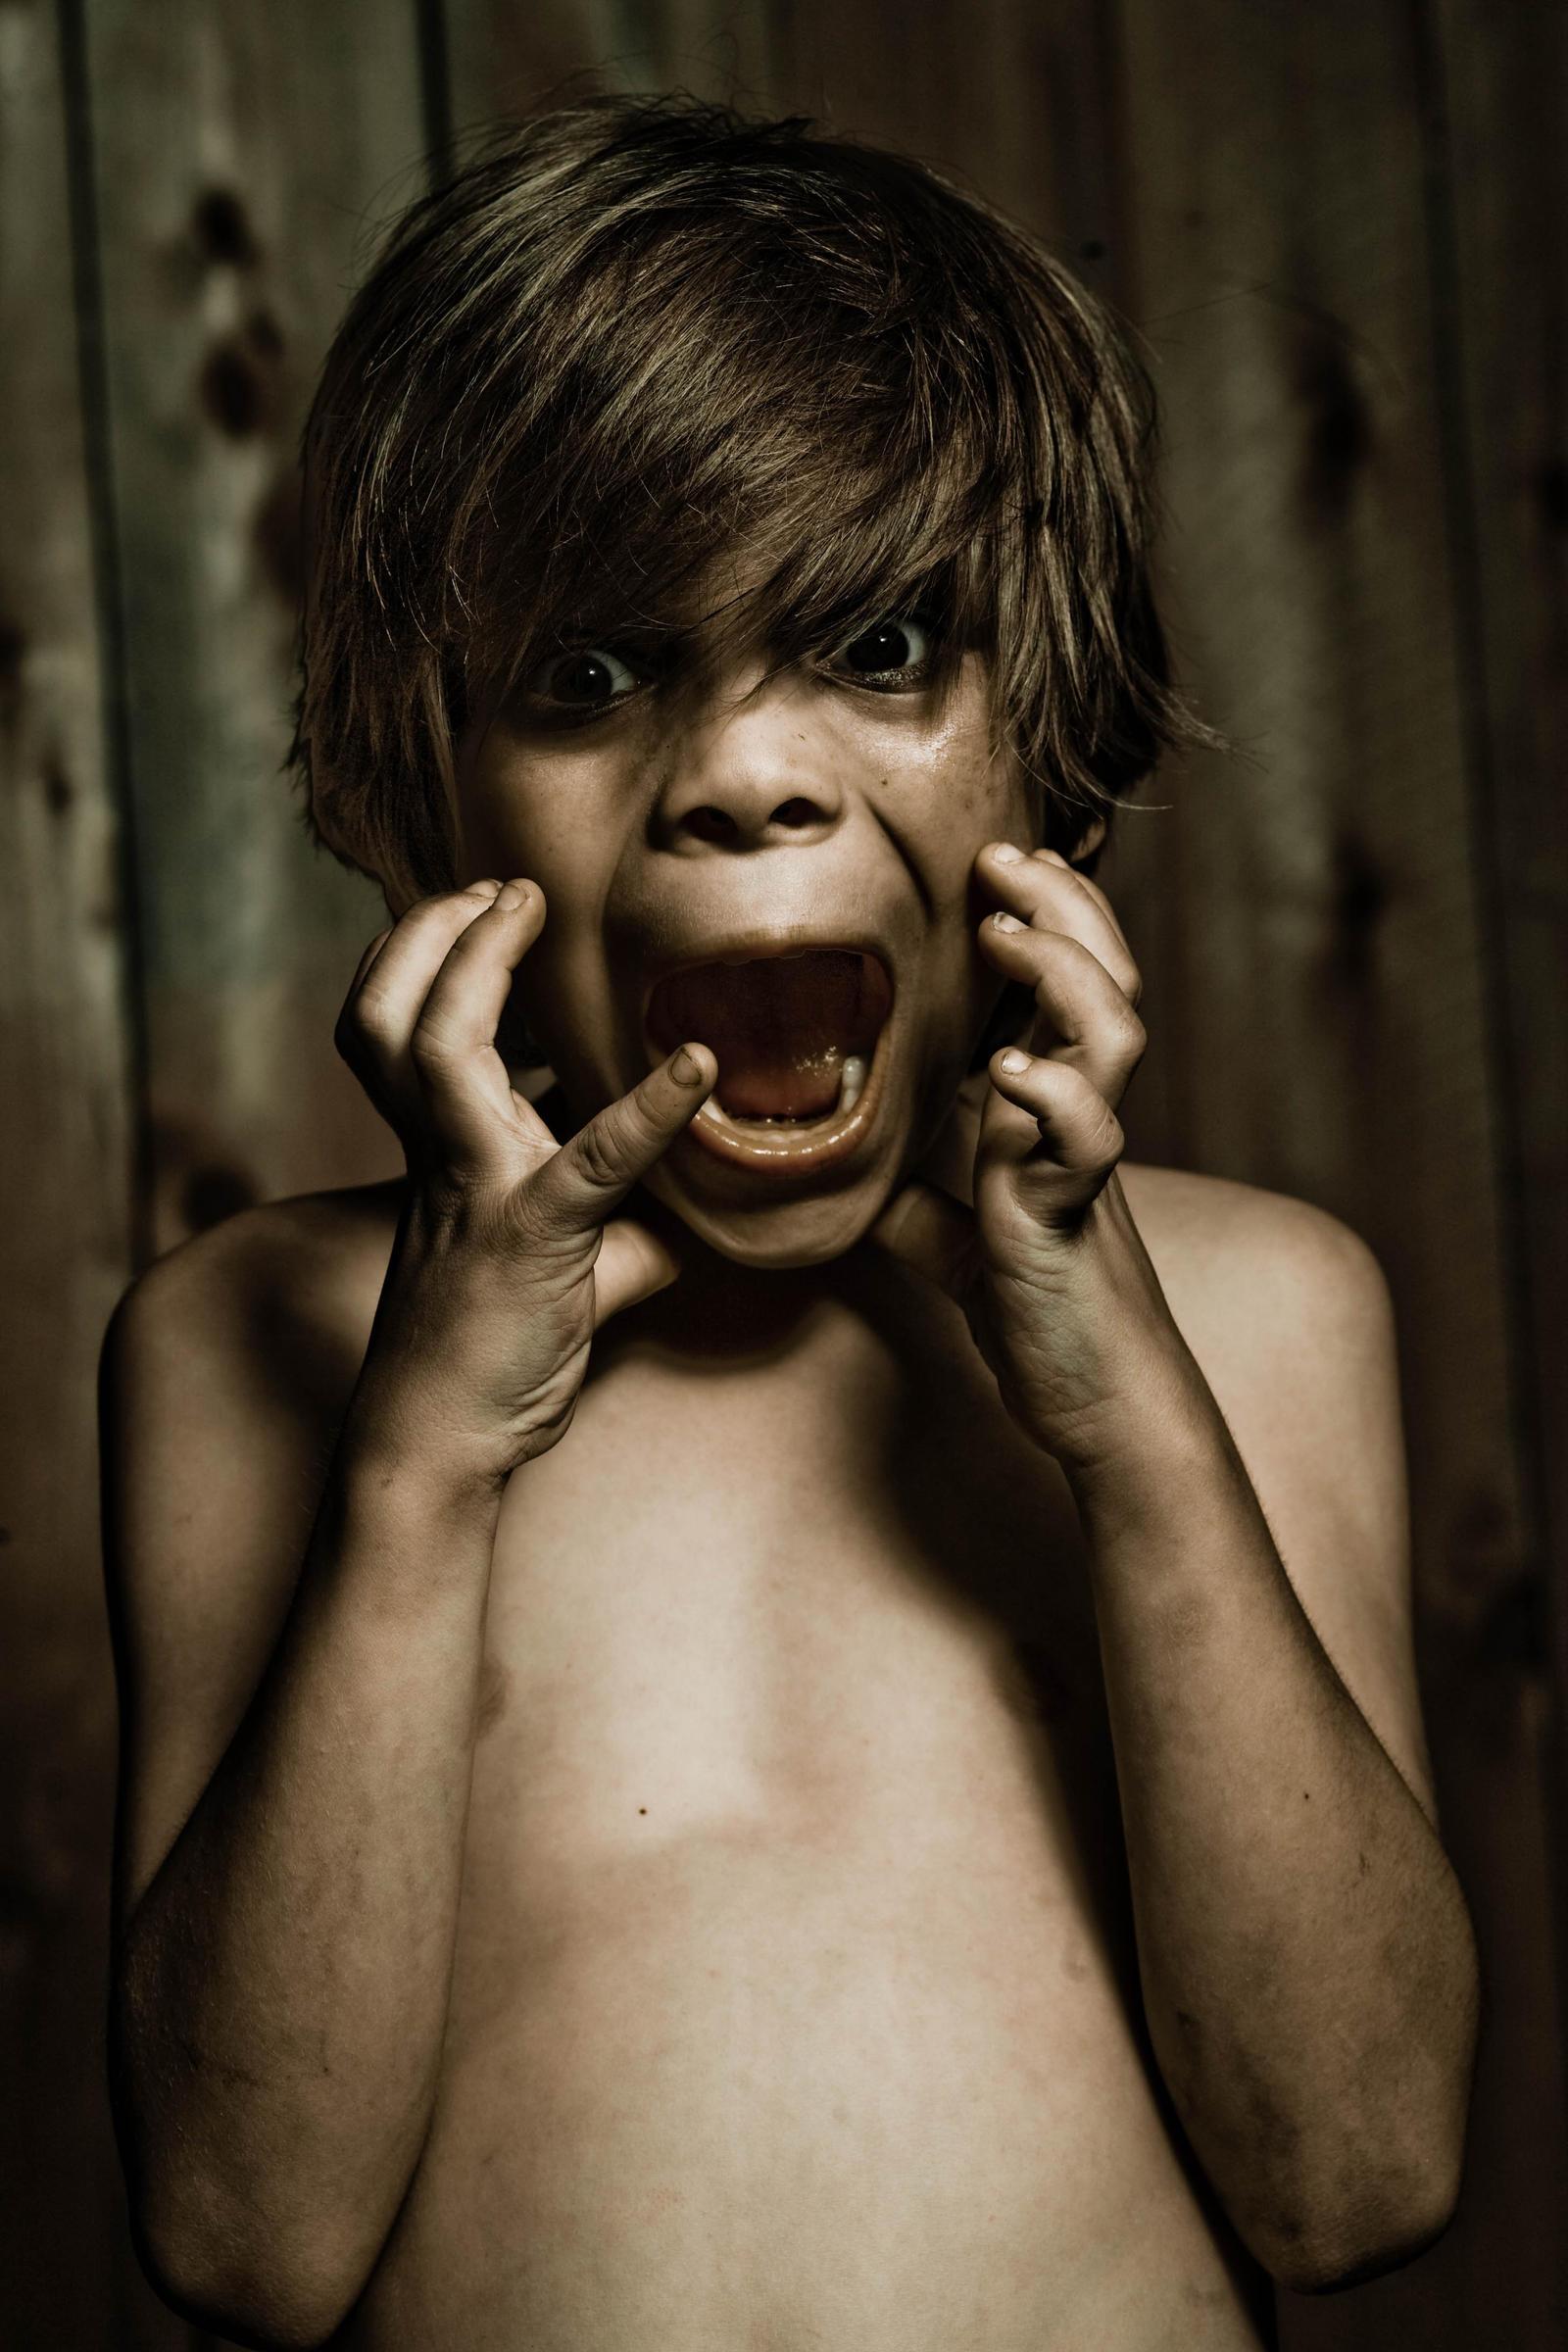 scared boy by VioletBreezeStock